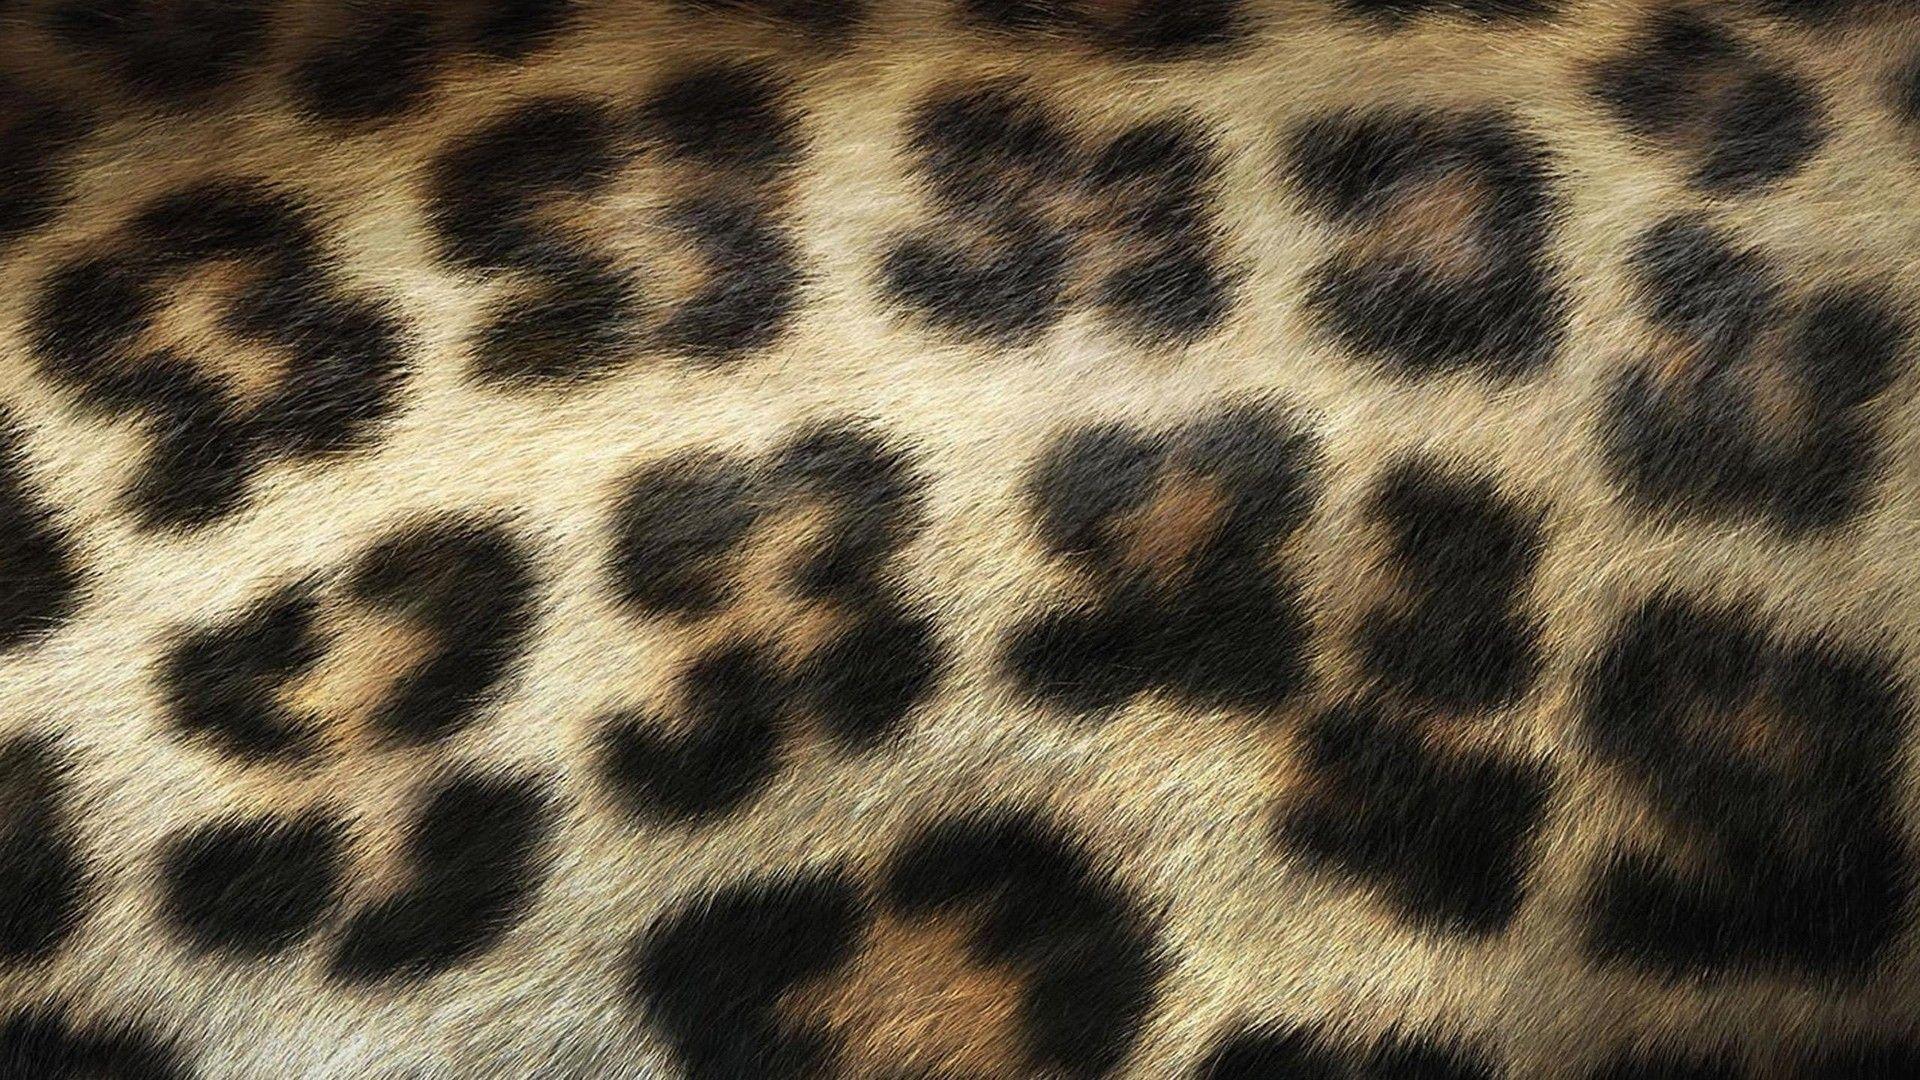 1920x1080 Leopard Print Hình nền HD